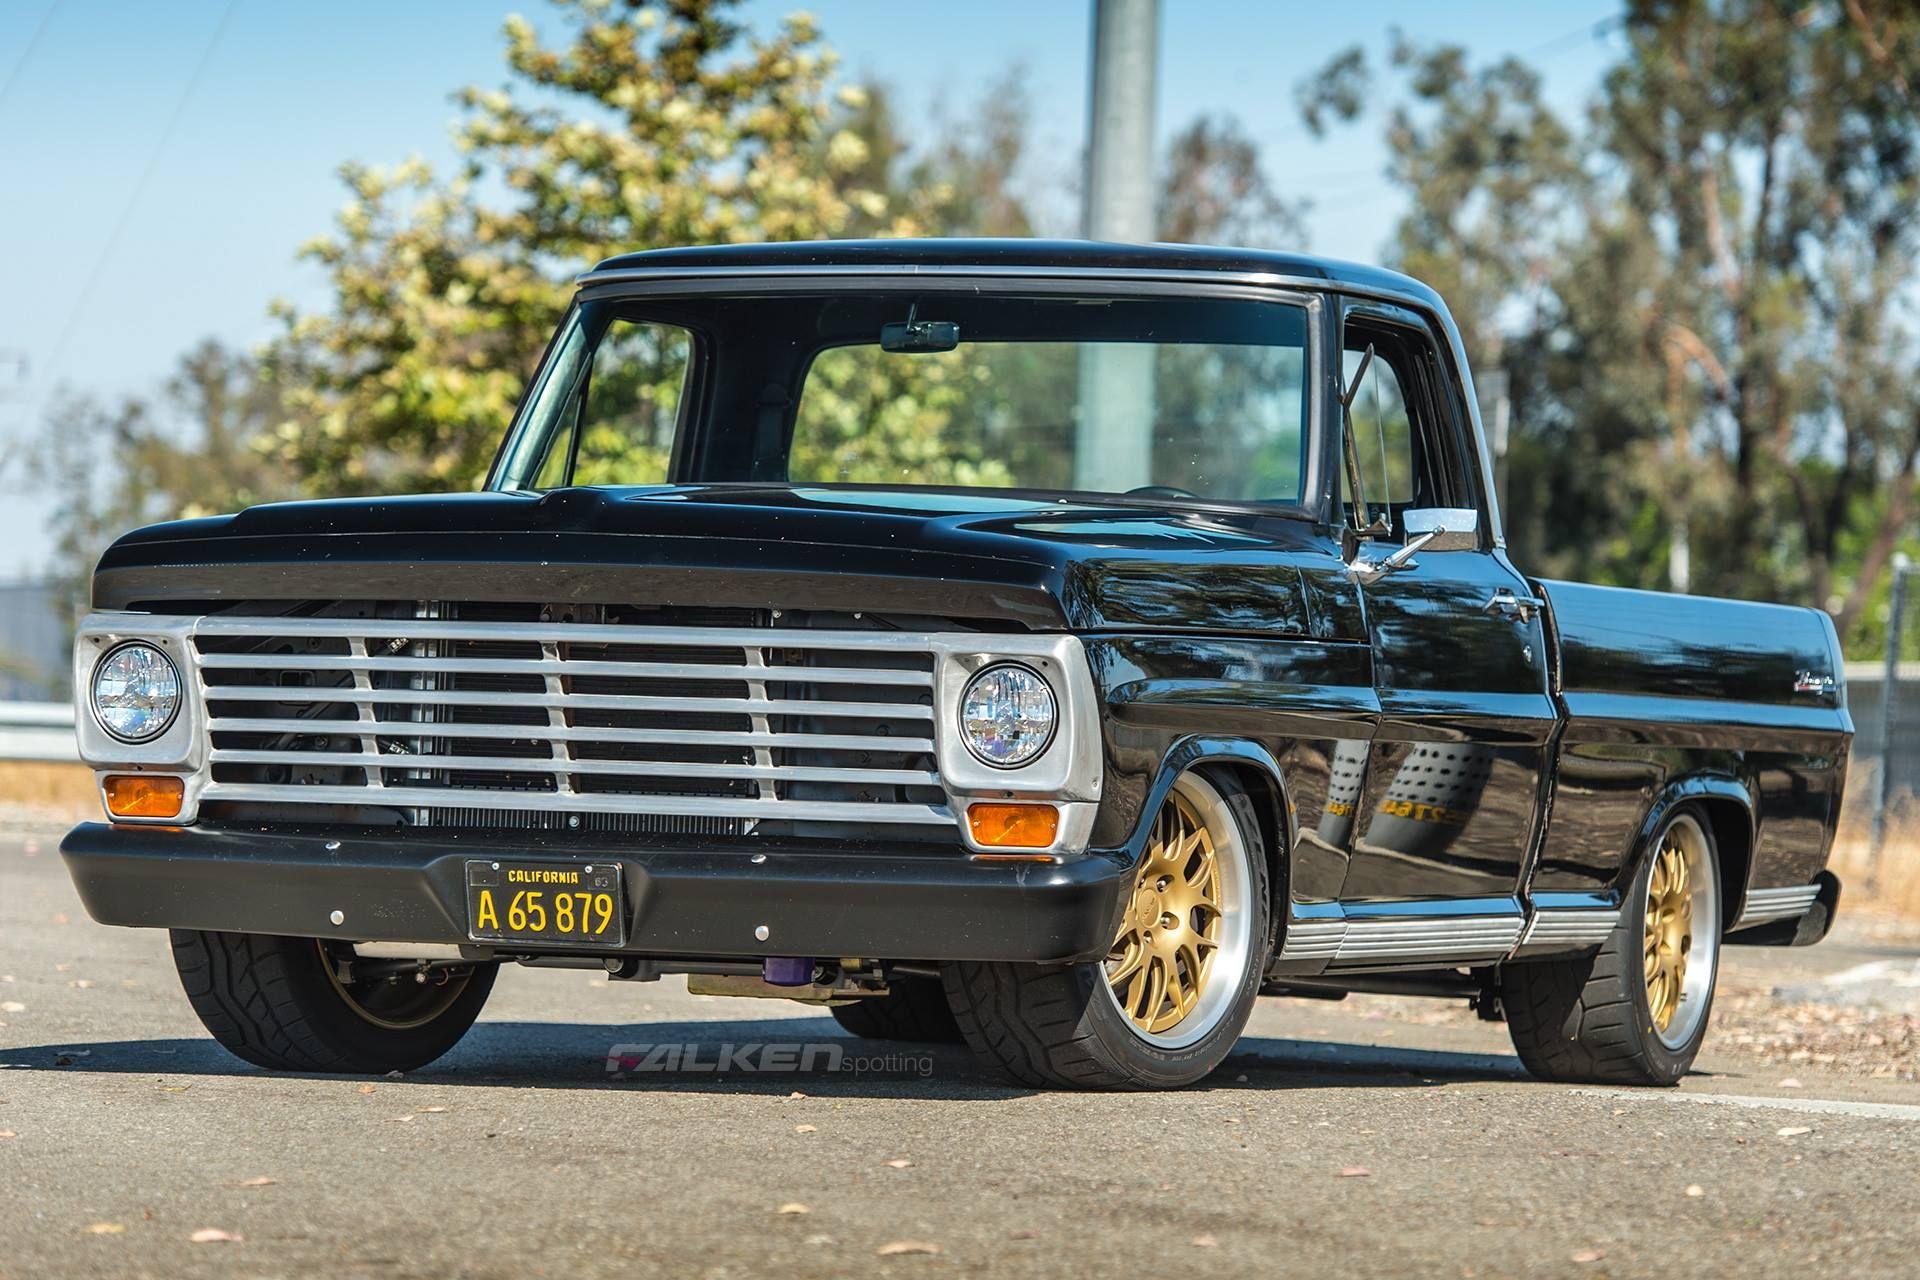 1964 Great Stance 64 Ford Pinterest Trucks And F 100 Custom 1969 F100